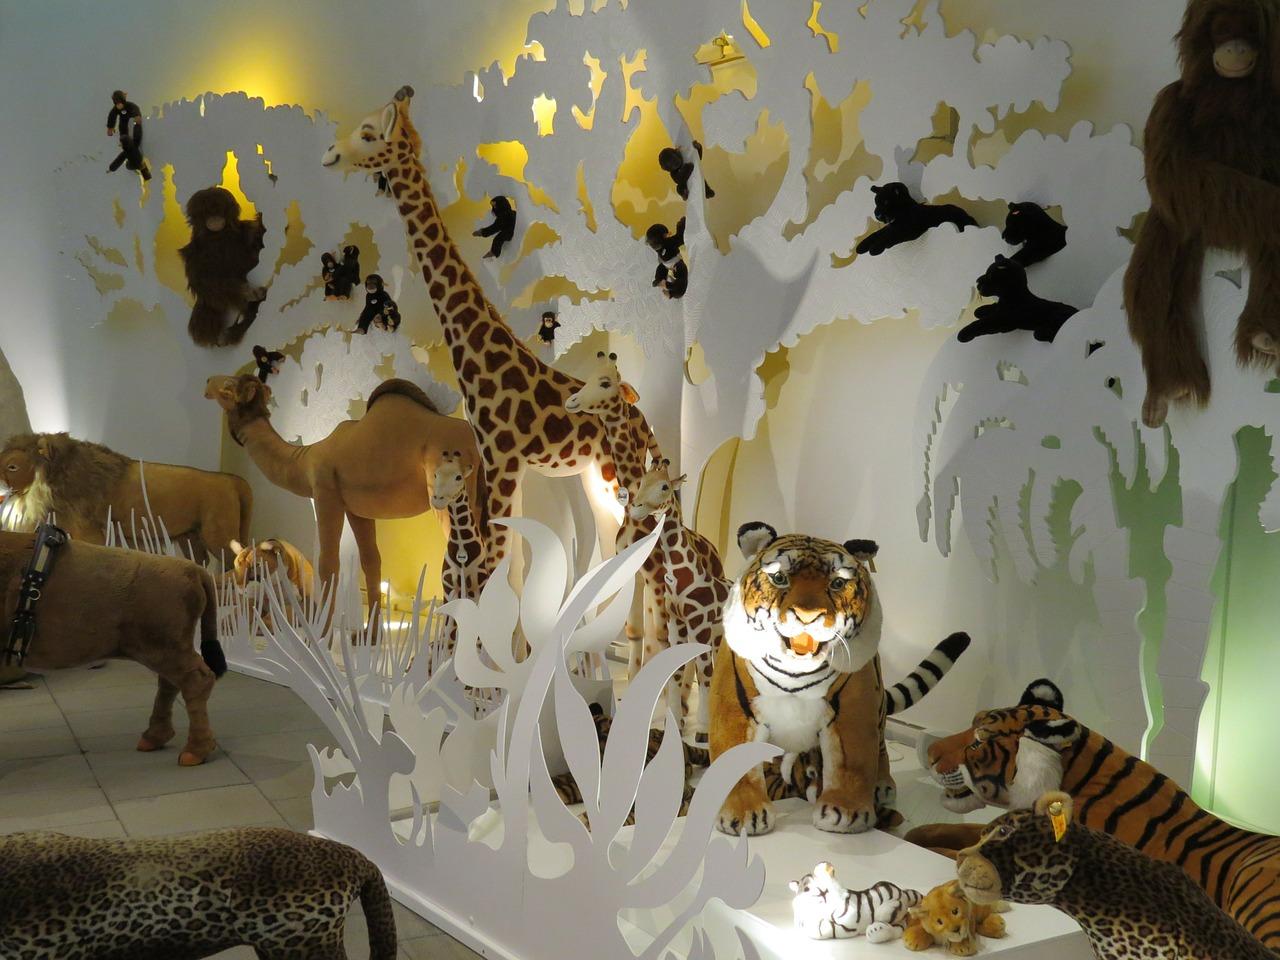 Sophie la girafe toxique , oui ou non ?